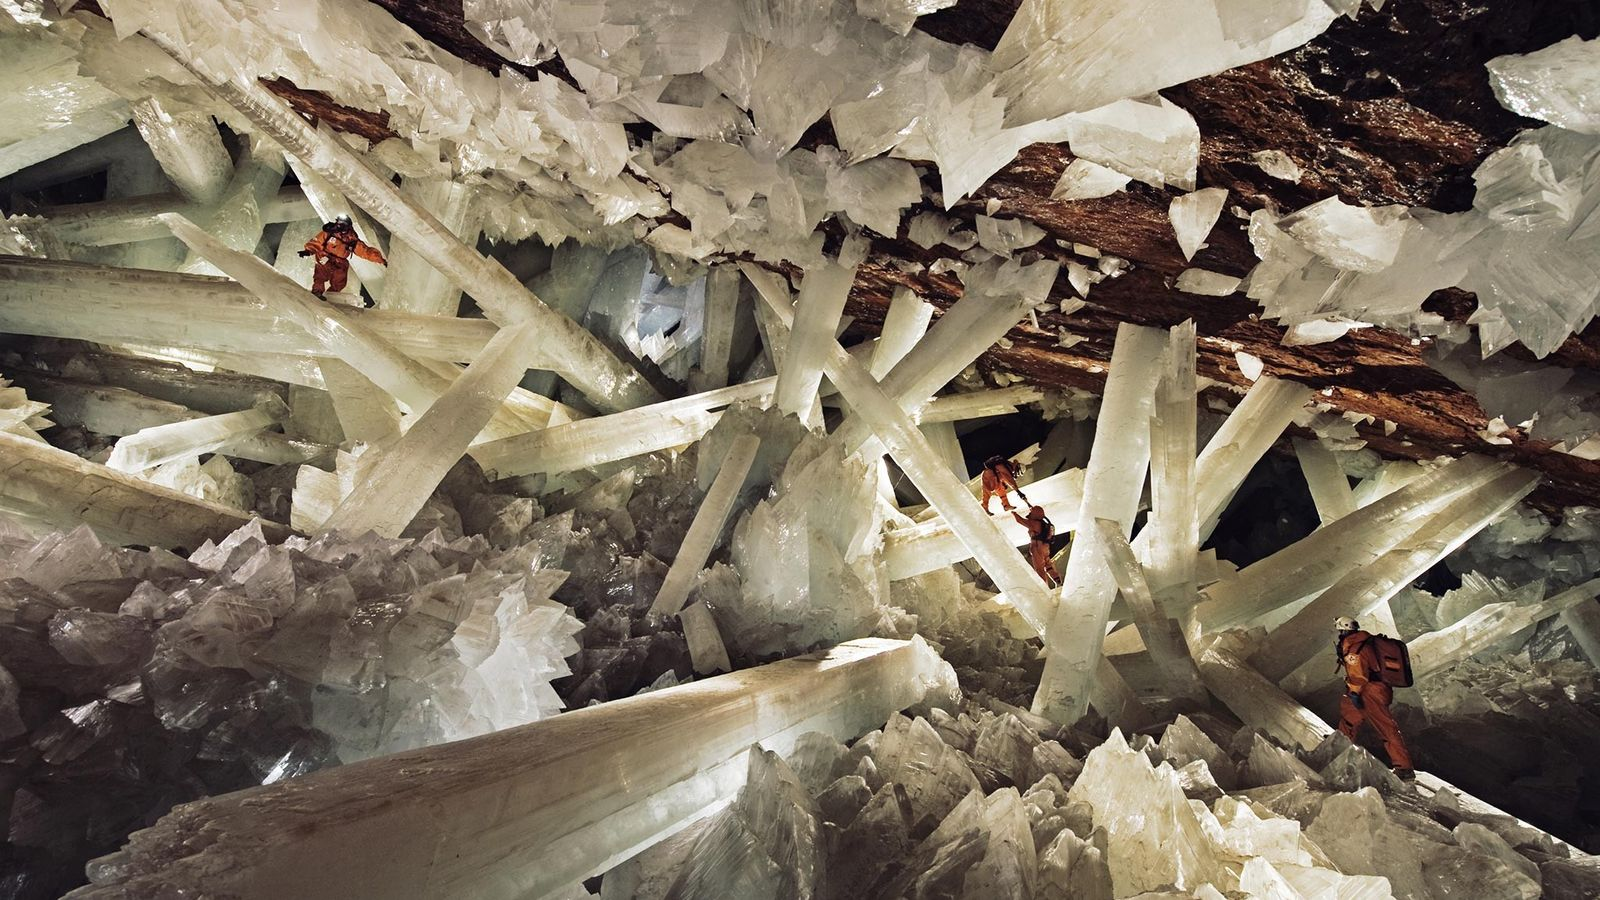 Roughly 300 metres (1,000 feet) beneath Earth's surface, gargantuan selenite crystals stud a hot, humid, normally ...